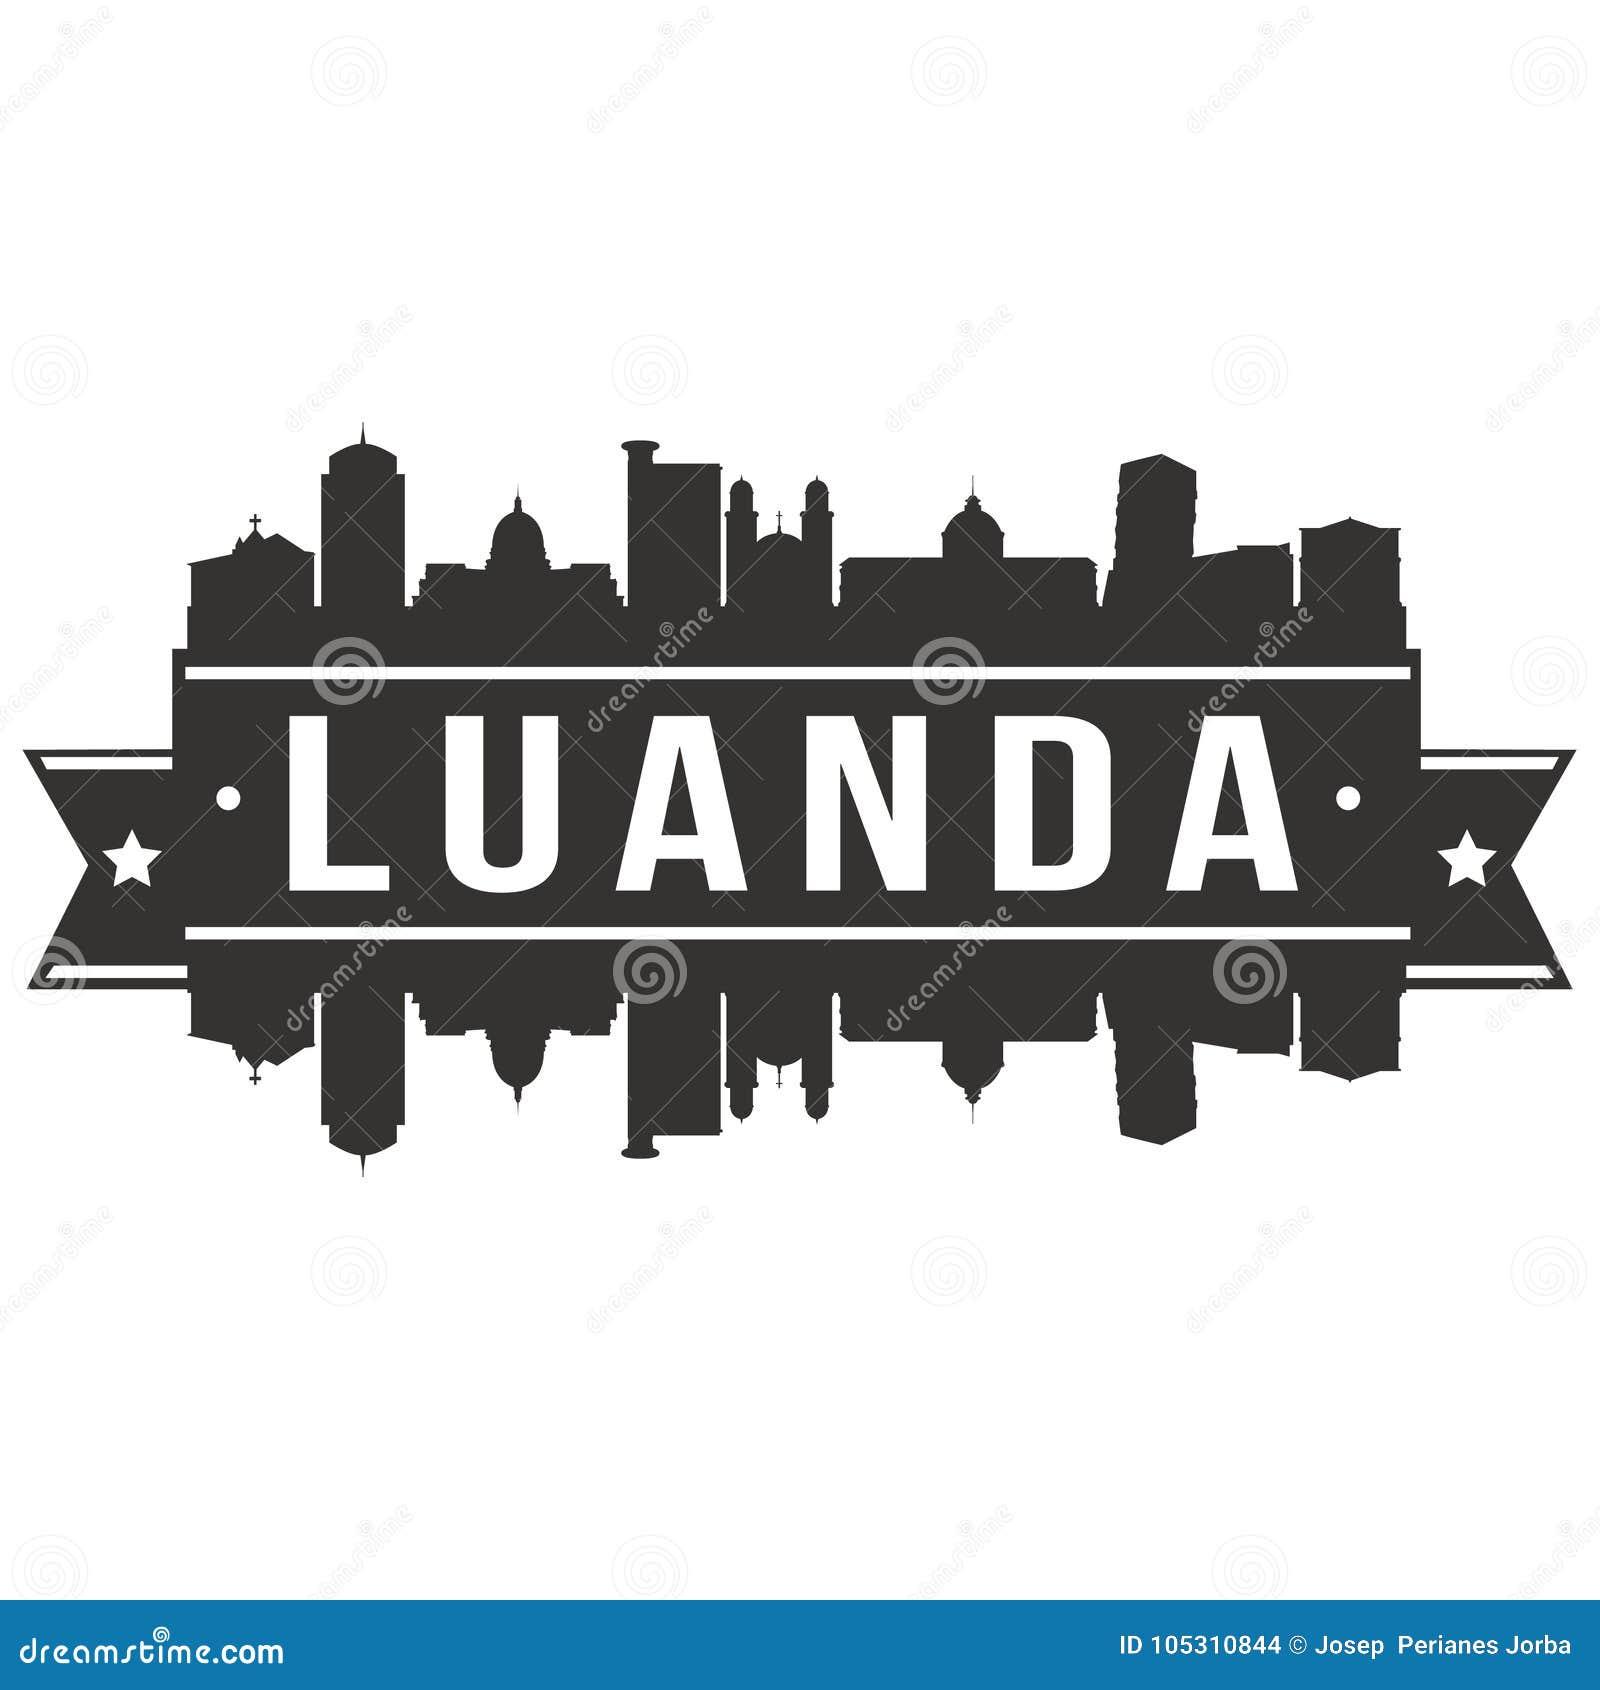 luanda angola africa icon vector art design skyline flat city